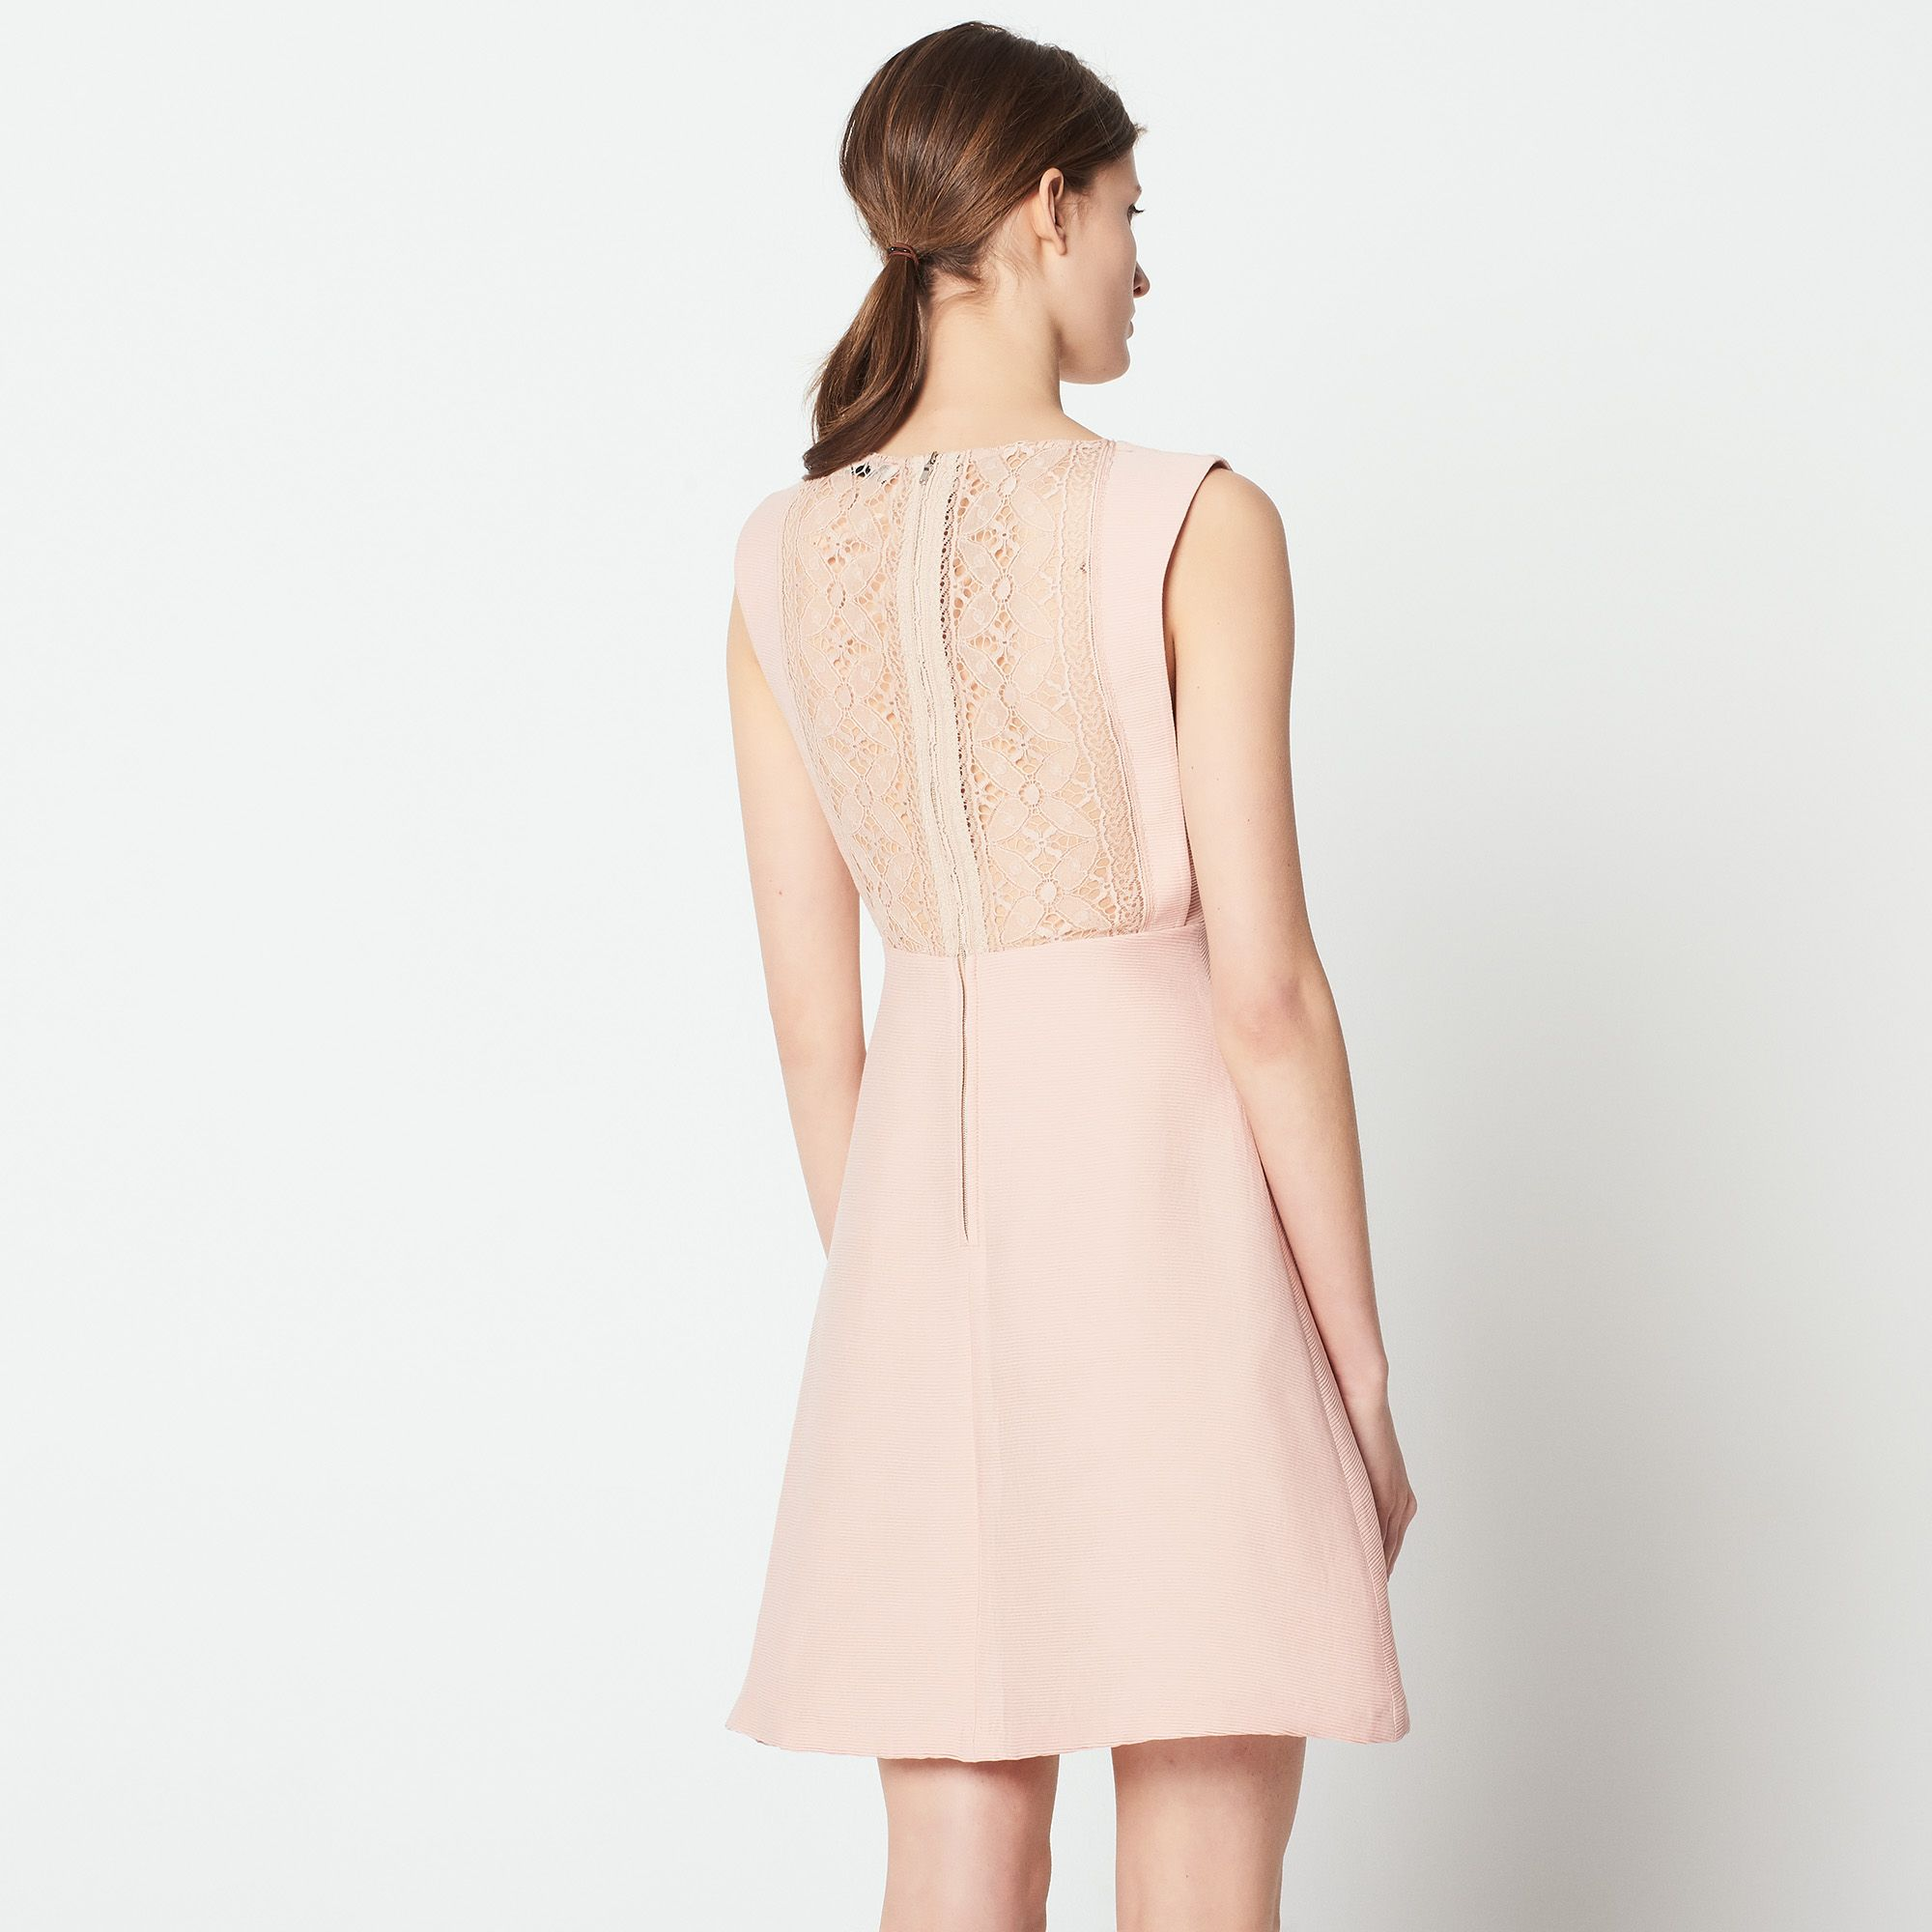 Sleeveless Dress Lace Back Dresses Sandro Paris Com Cheap Summer Outfits Lace Back Dresses Dresses